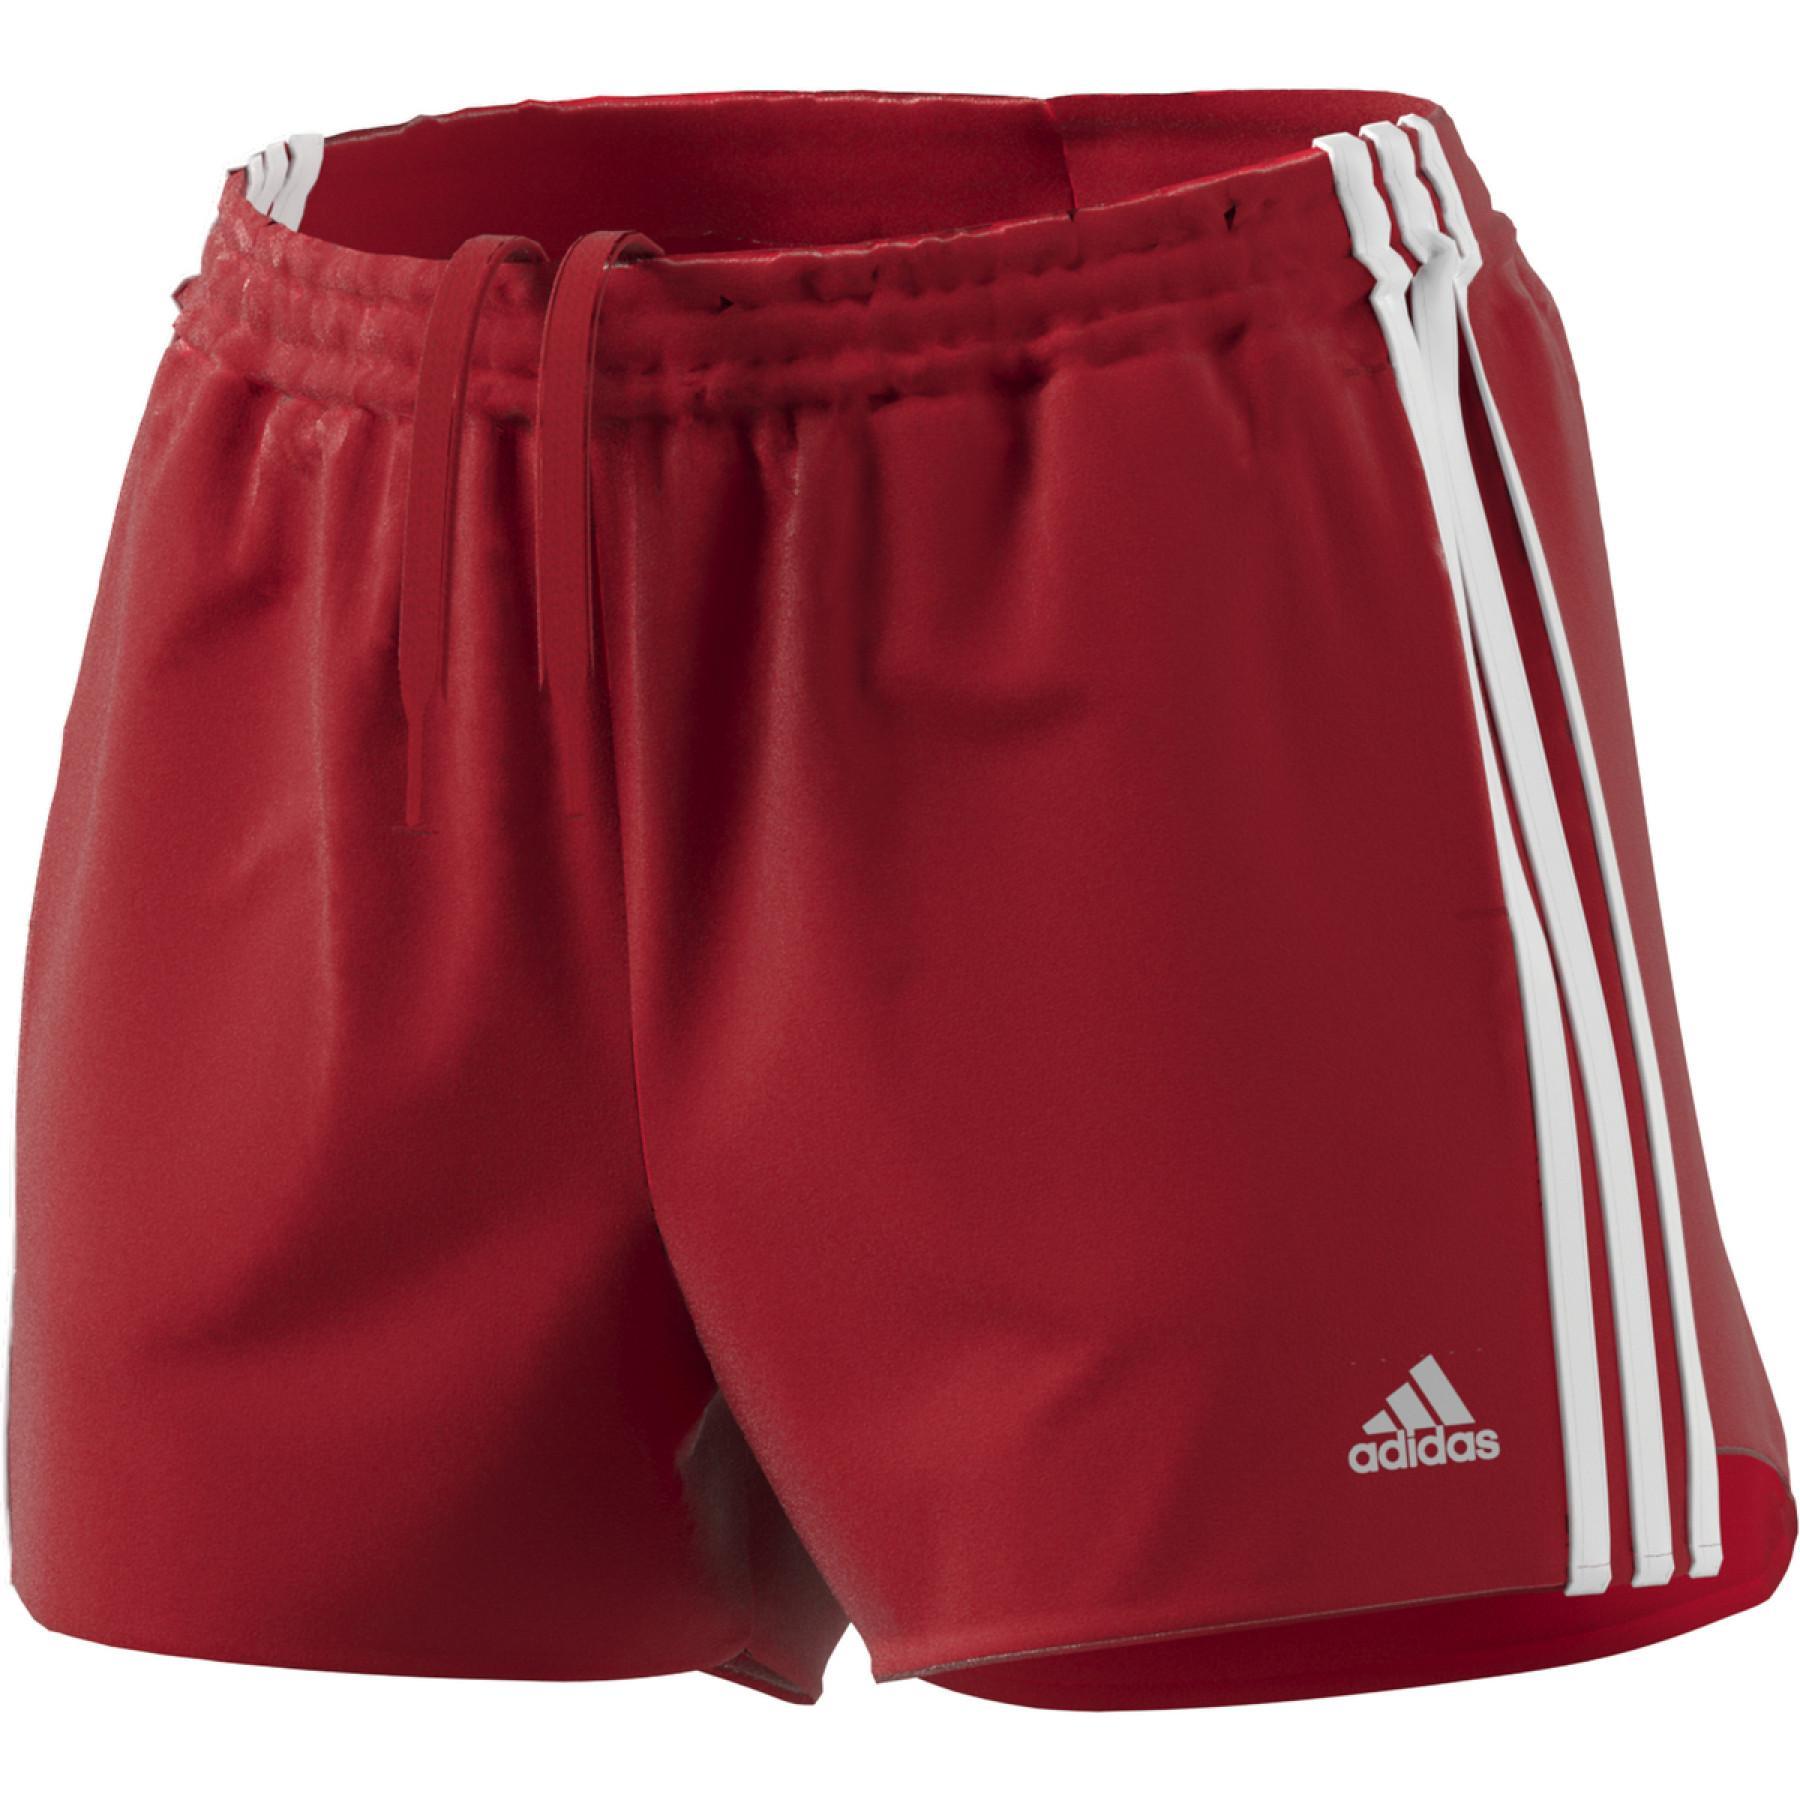 adidas Primeblue Designed 2 Move Woven 3-Strap Shorts for Women